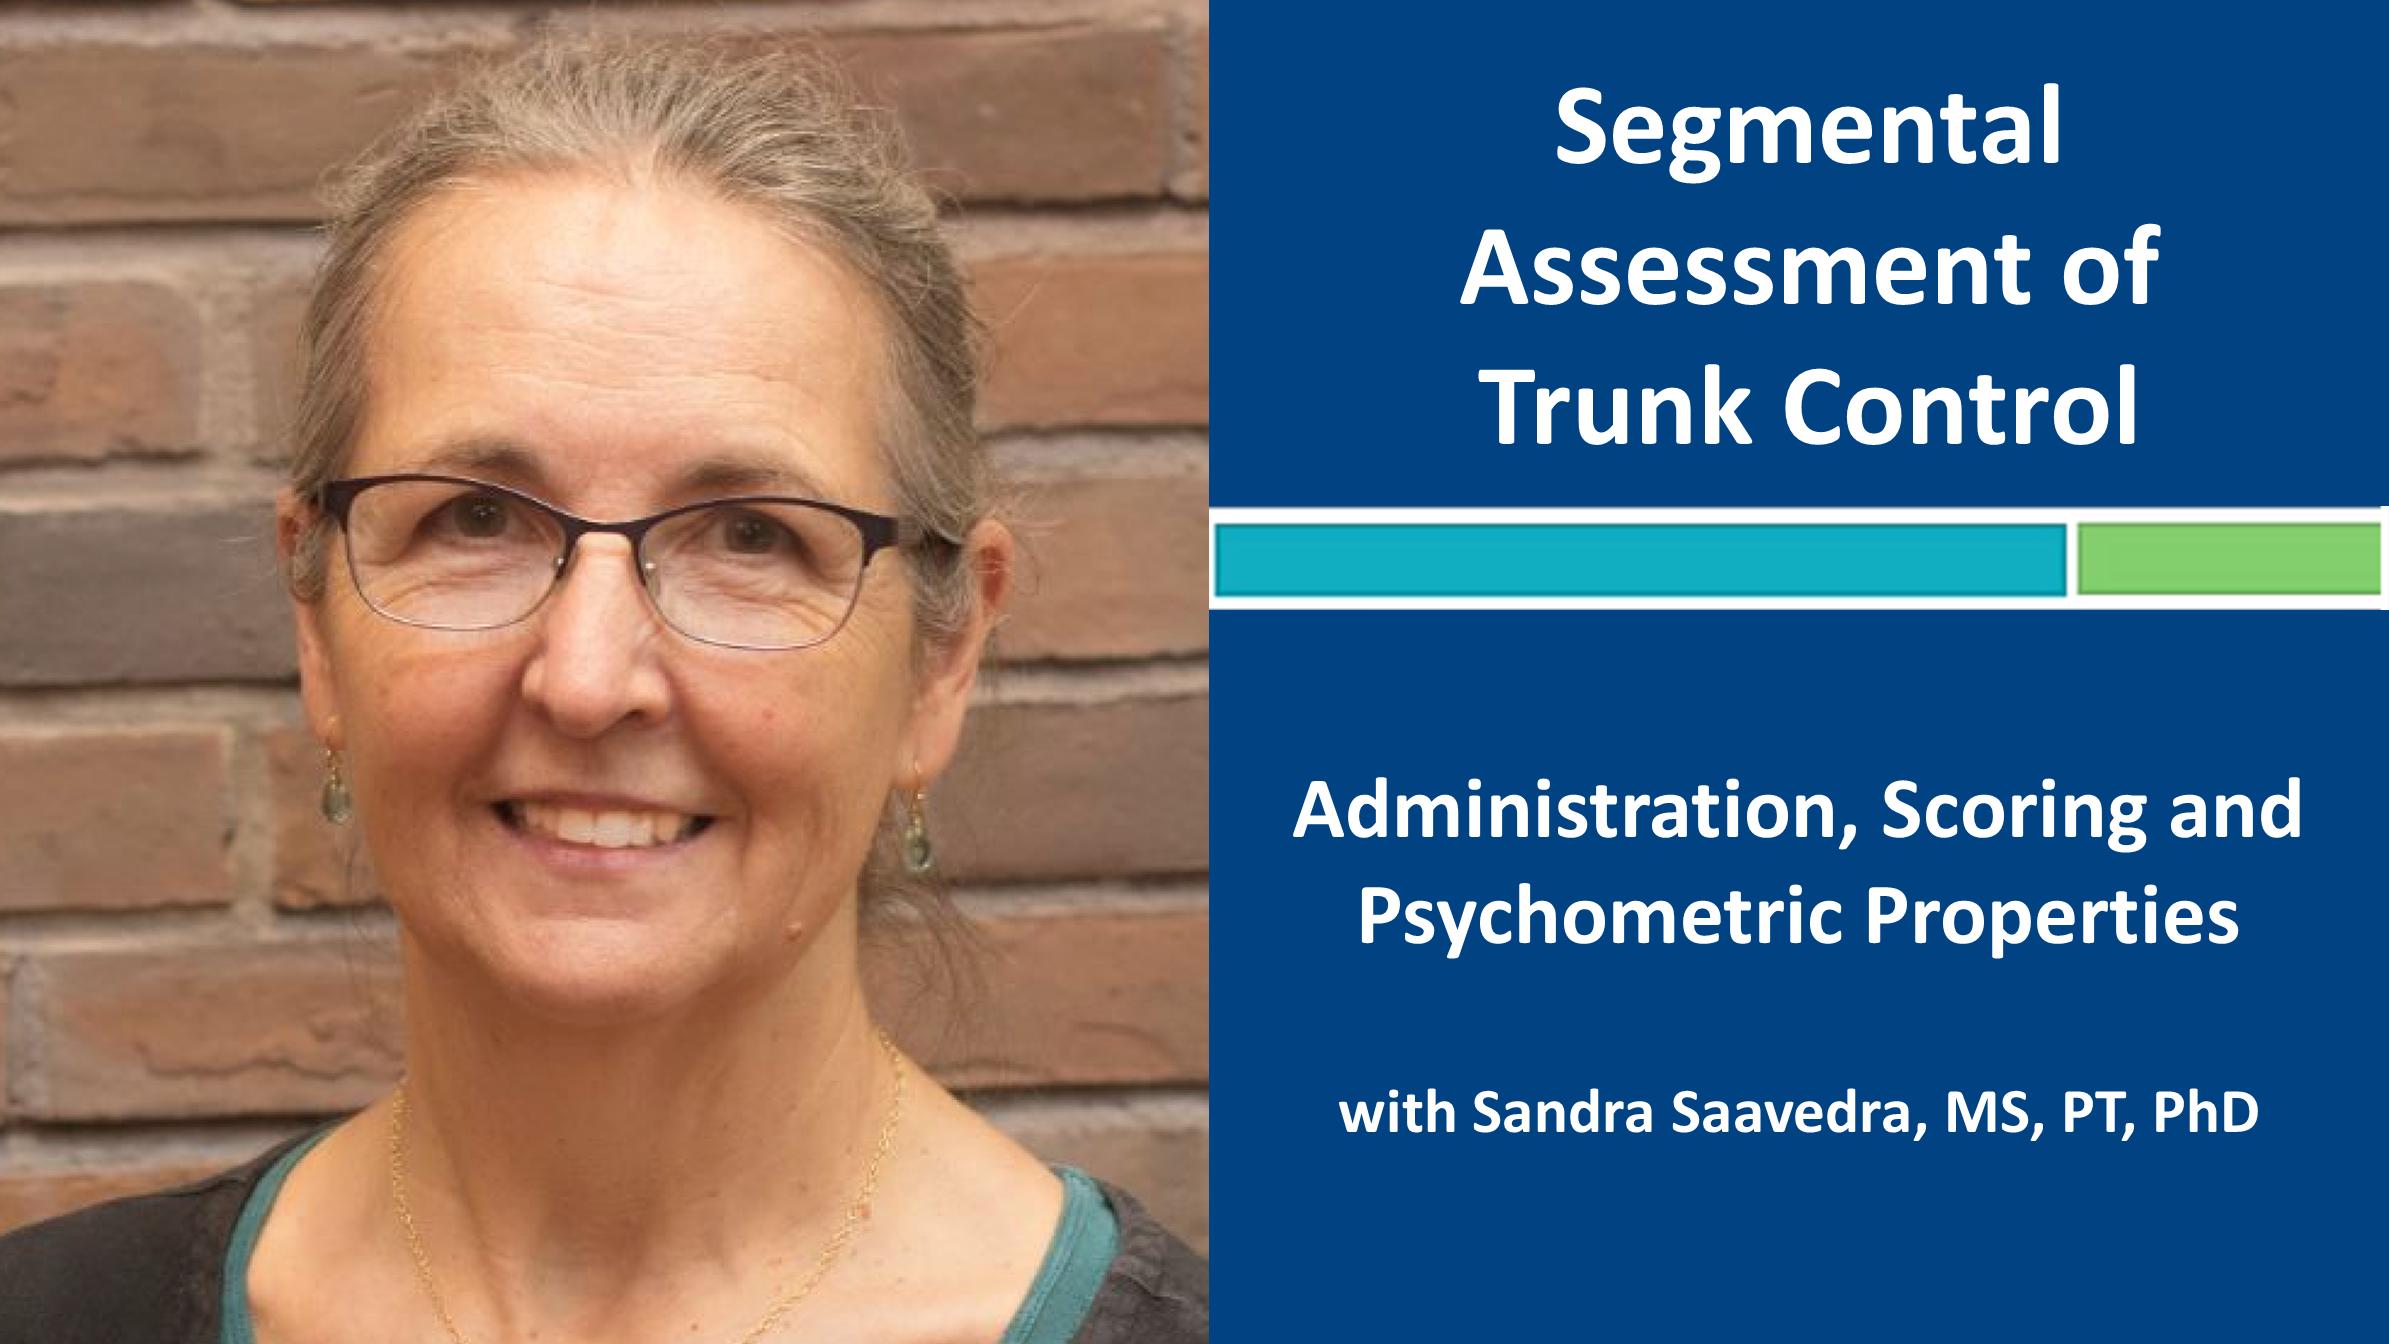 Segmental Assessment of Trunk Control (SATCo): Administration, Scoring and Psychometrics with Sandra Saavedra, MS, PT, PhD